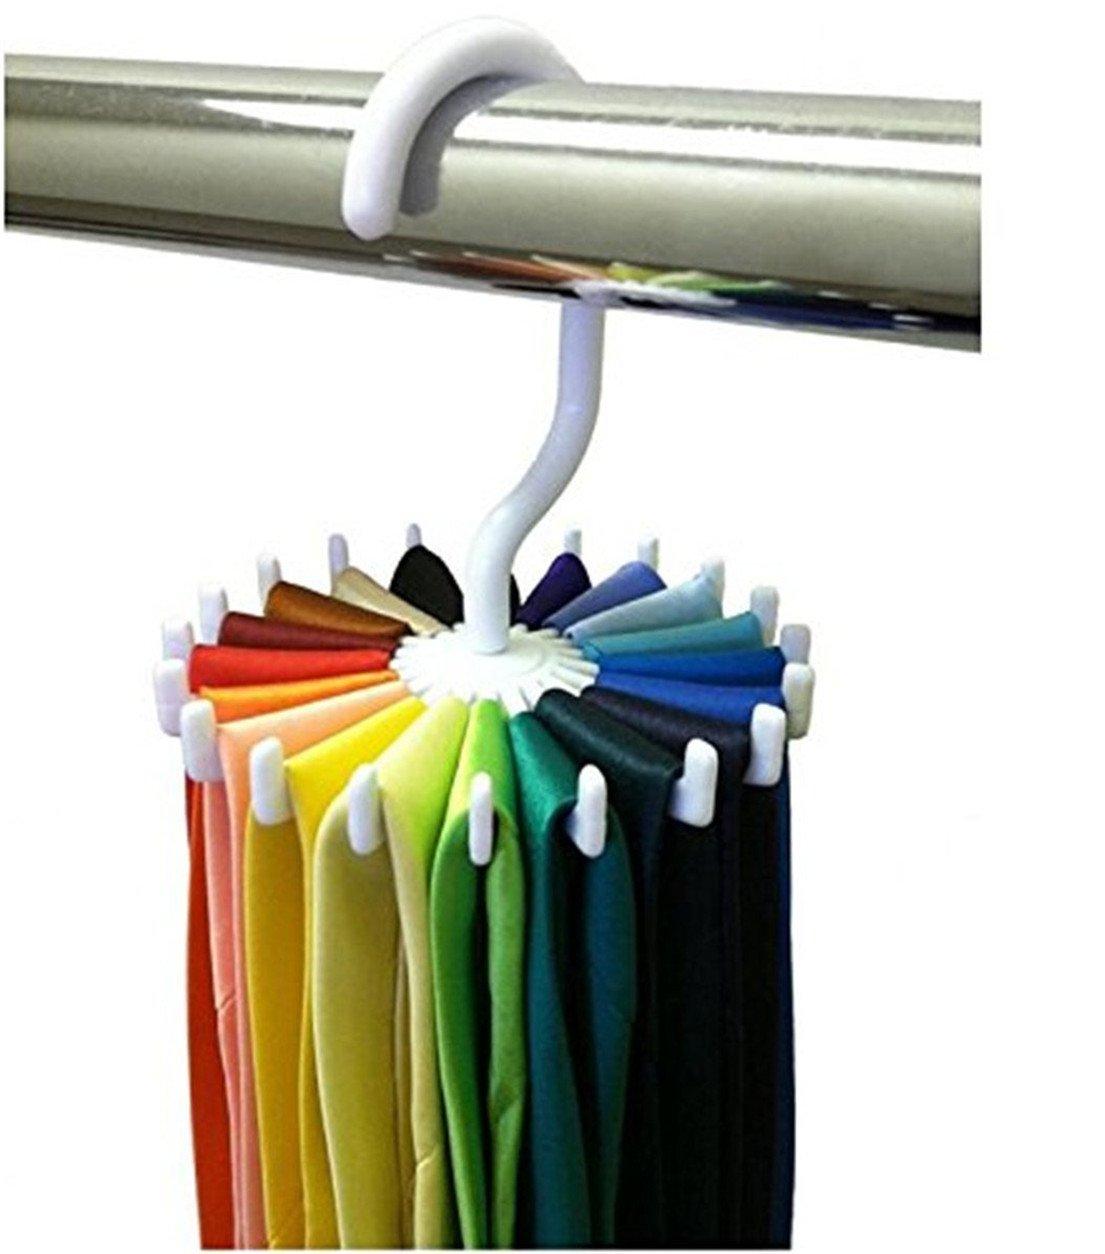 1 PC 360 Degree Rotating Twirl Tie Rack Adjustable Tie Belt Scarf Hanger Holder Hook Ties Scarf for Closet Organizer Storage